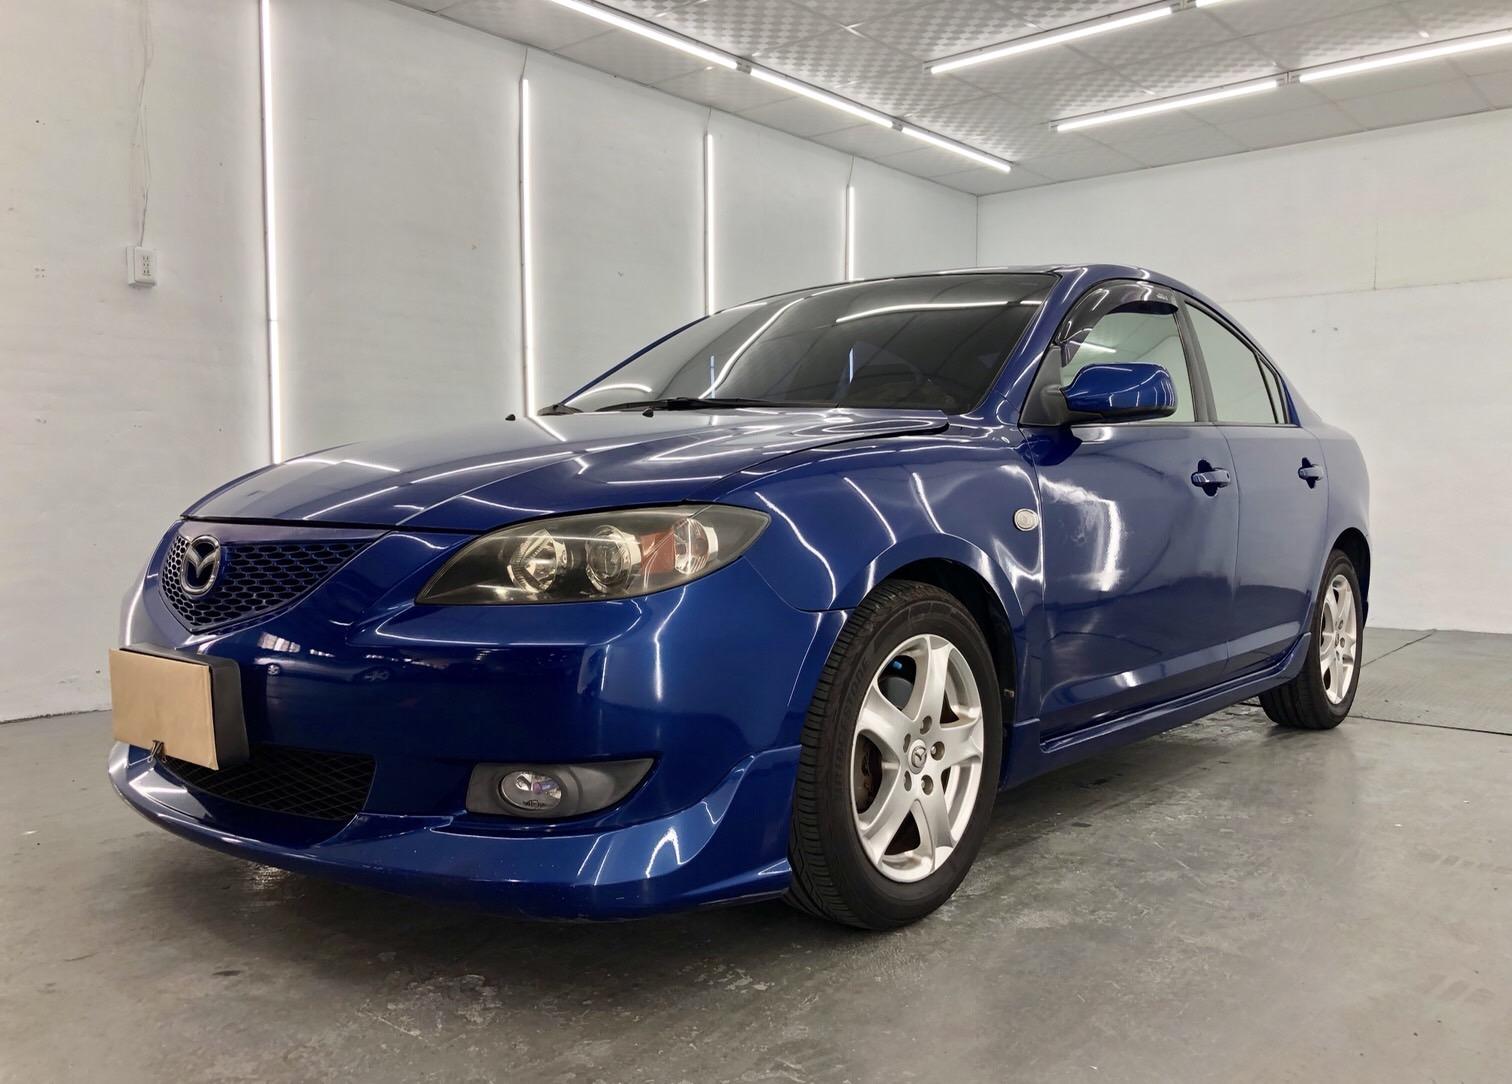 2005 Mazda 馬自達 3